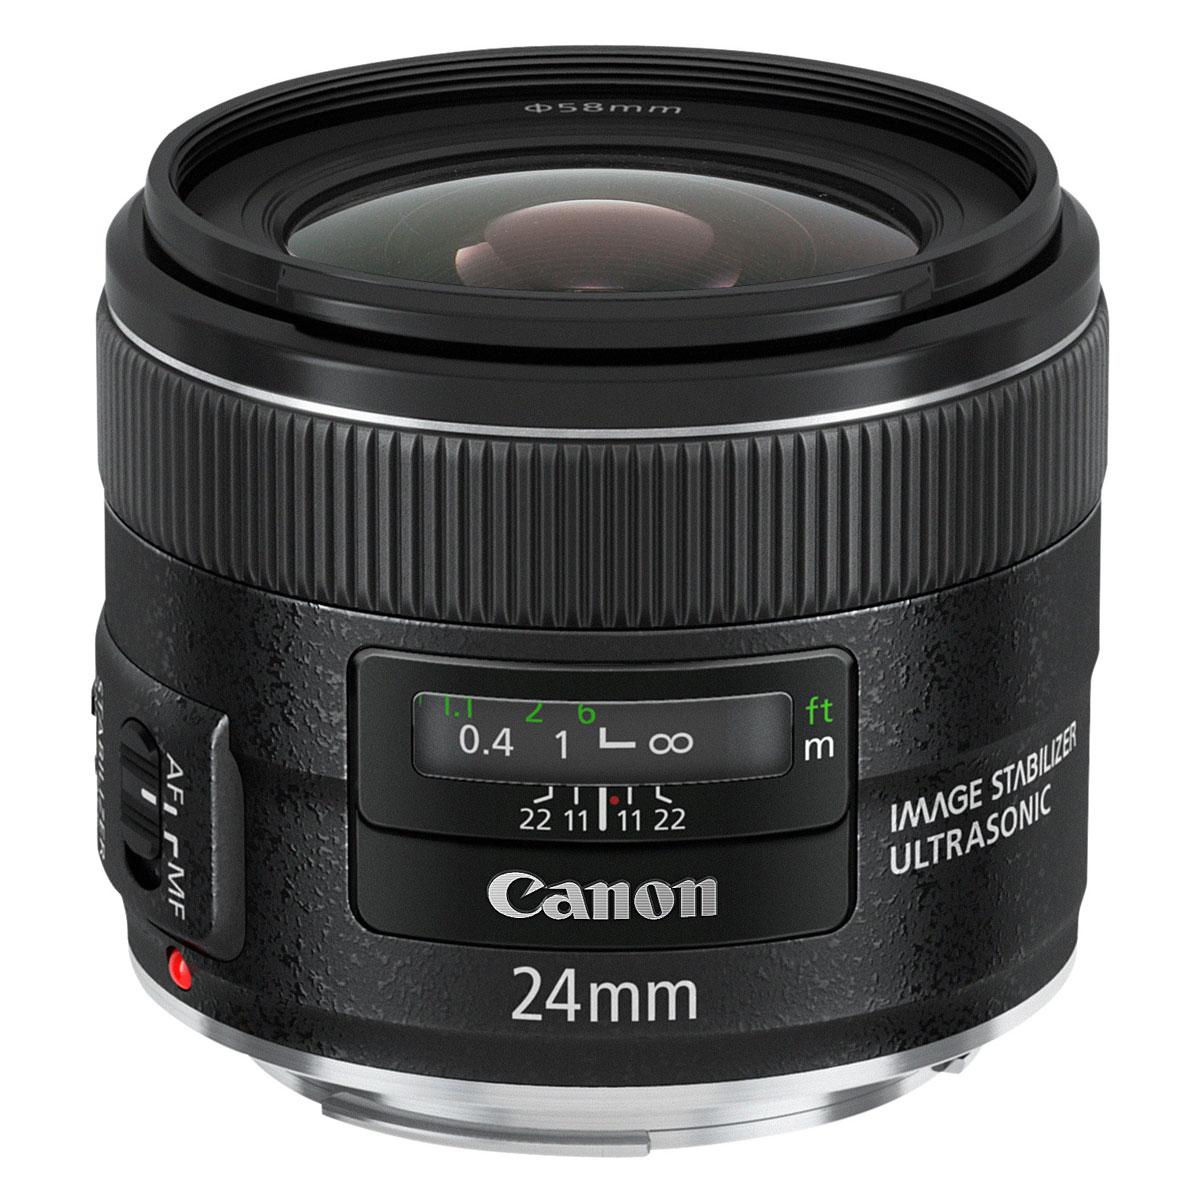 Objectif appareil photo Canon EF 24 mm f/2,8 IS USM Objectif grand-angle stabilisé